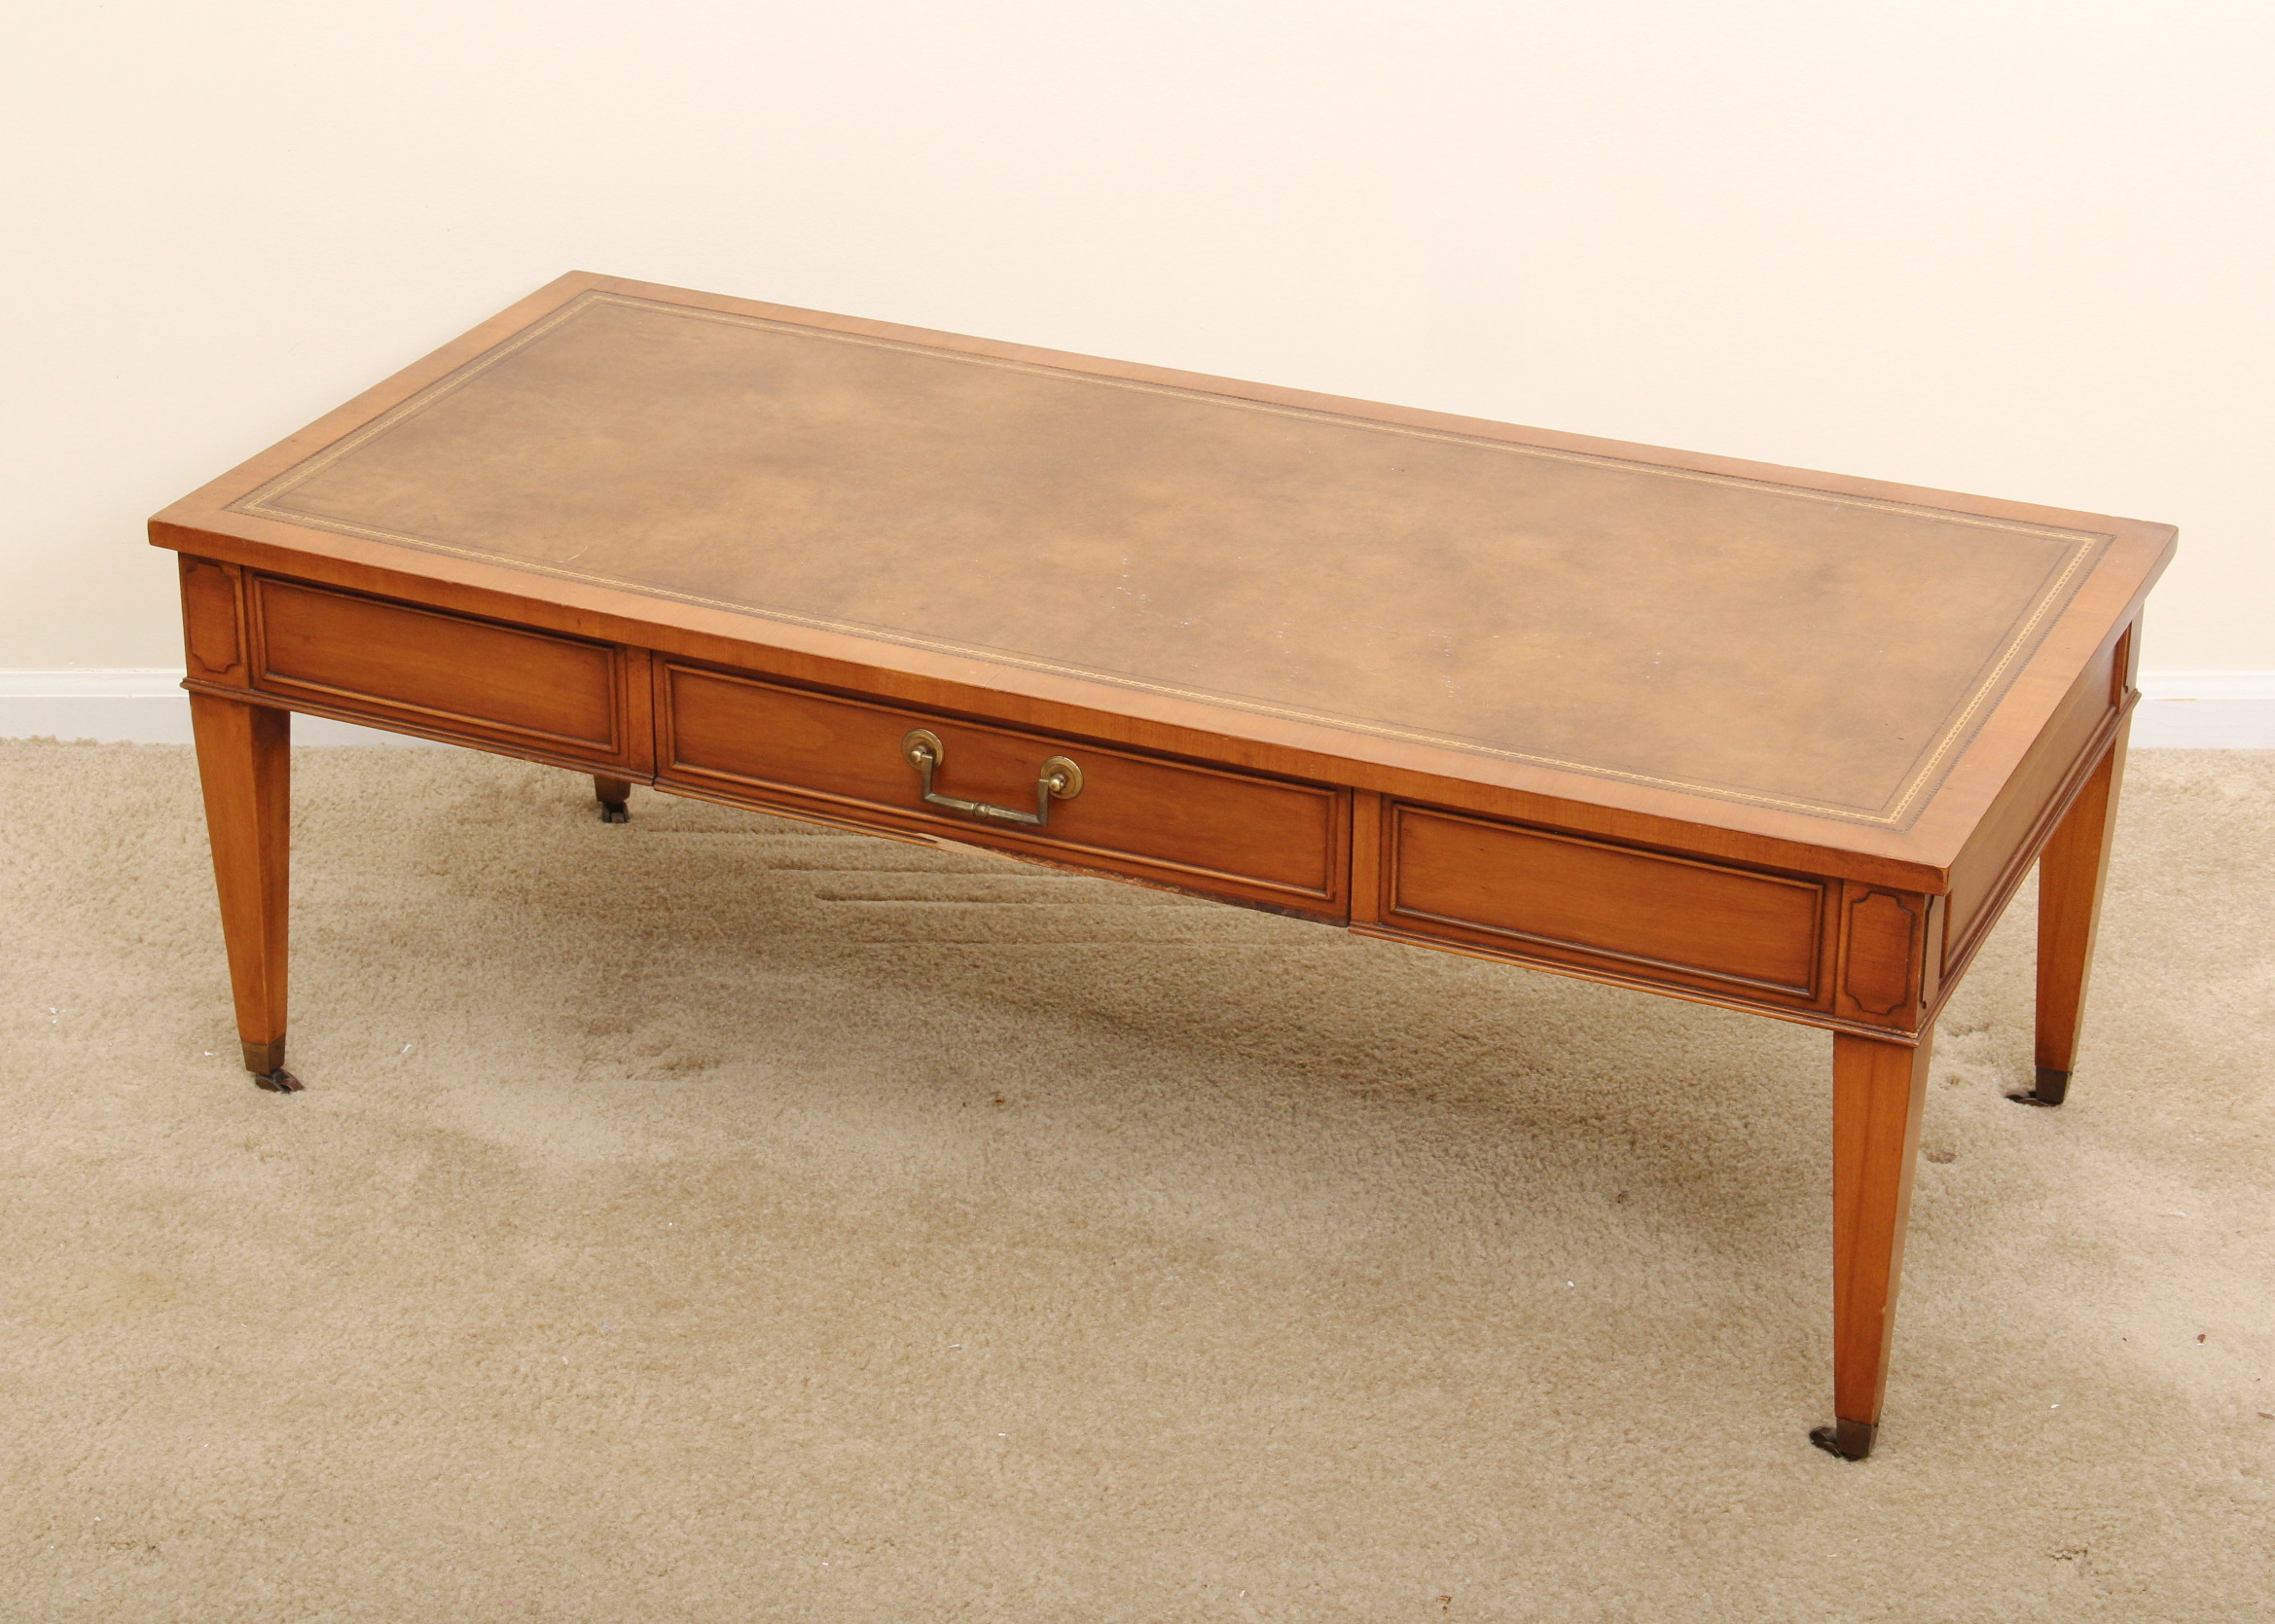 Vintage Hekman Furniture Leather Inlay Coffee Table EBTH